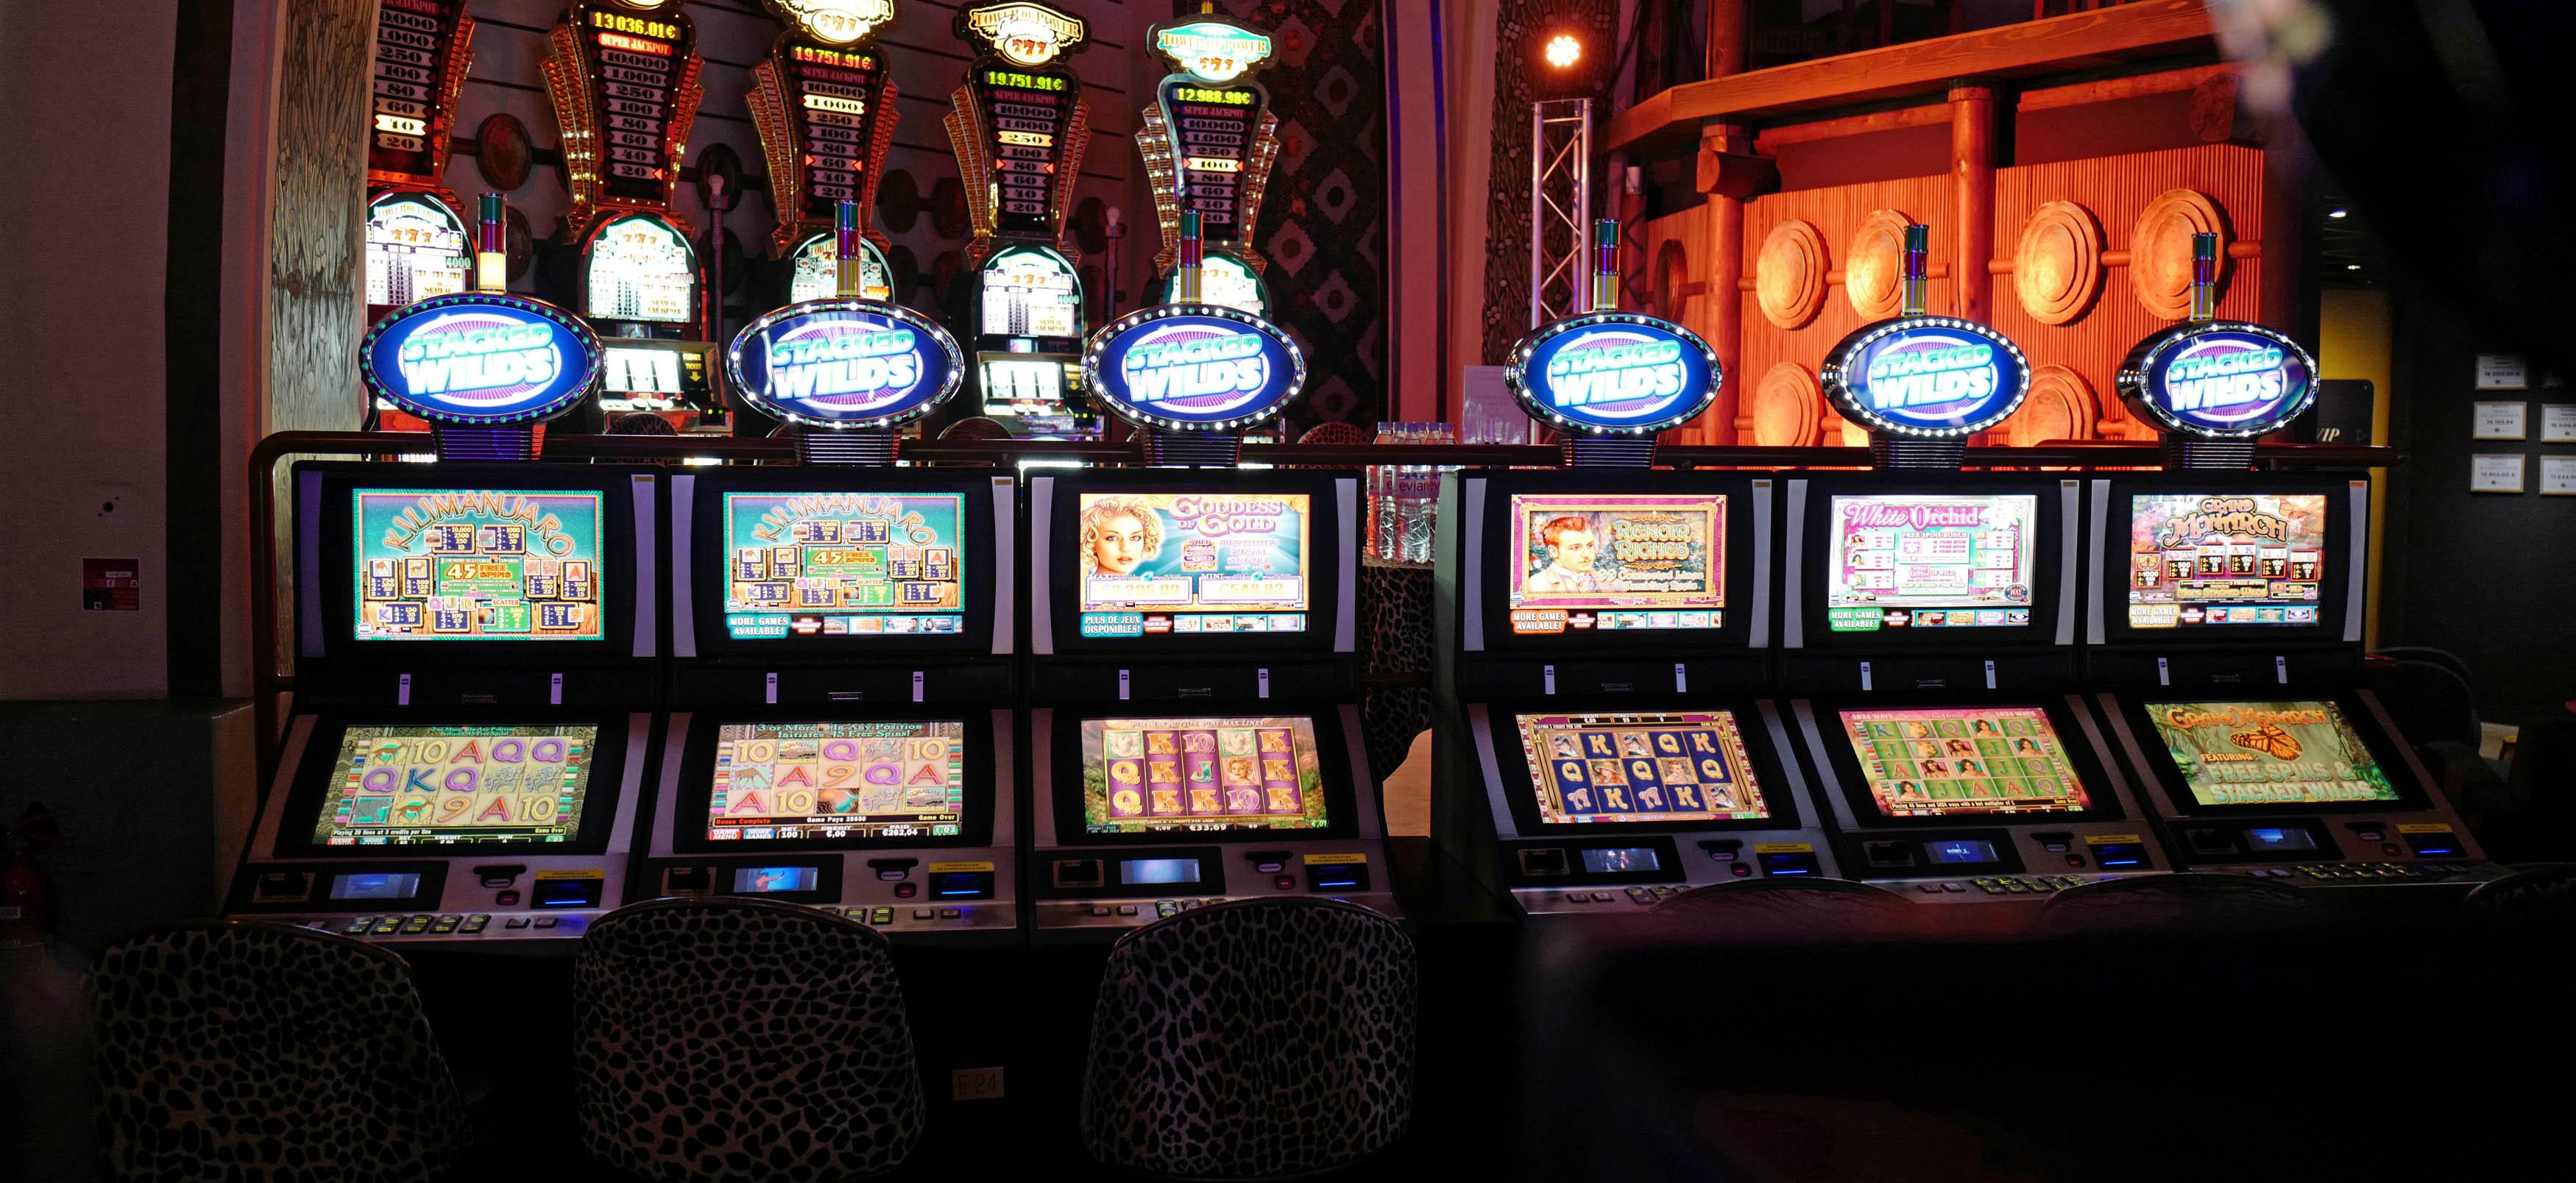 Casino jeux gratuits partouche hotels near star city casino birmingham